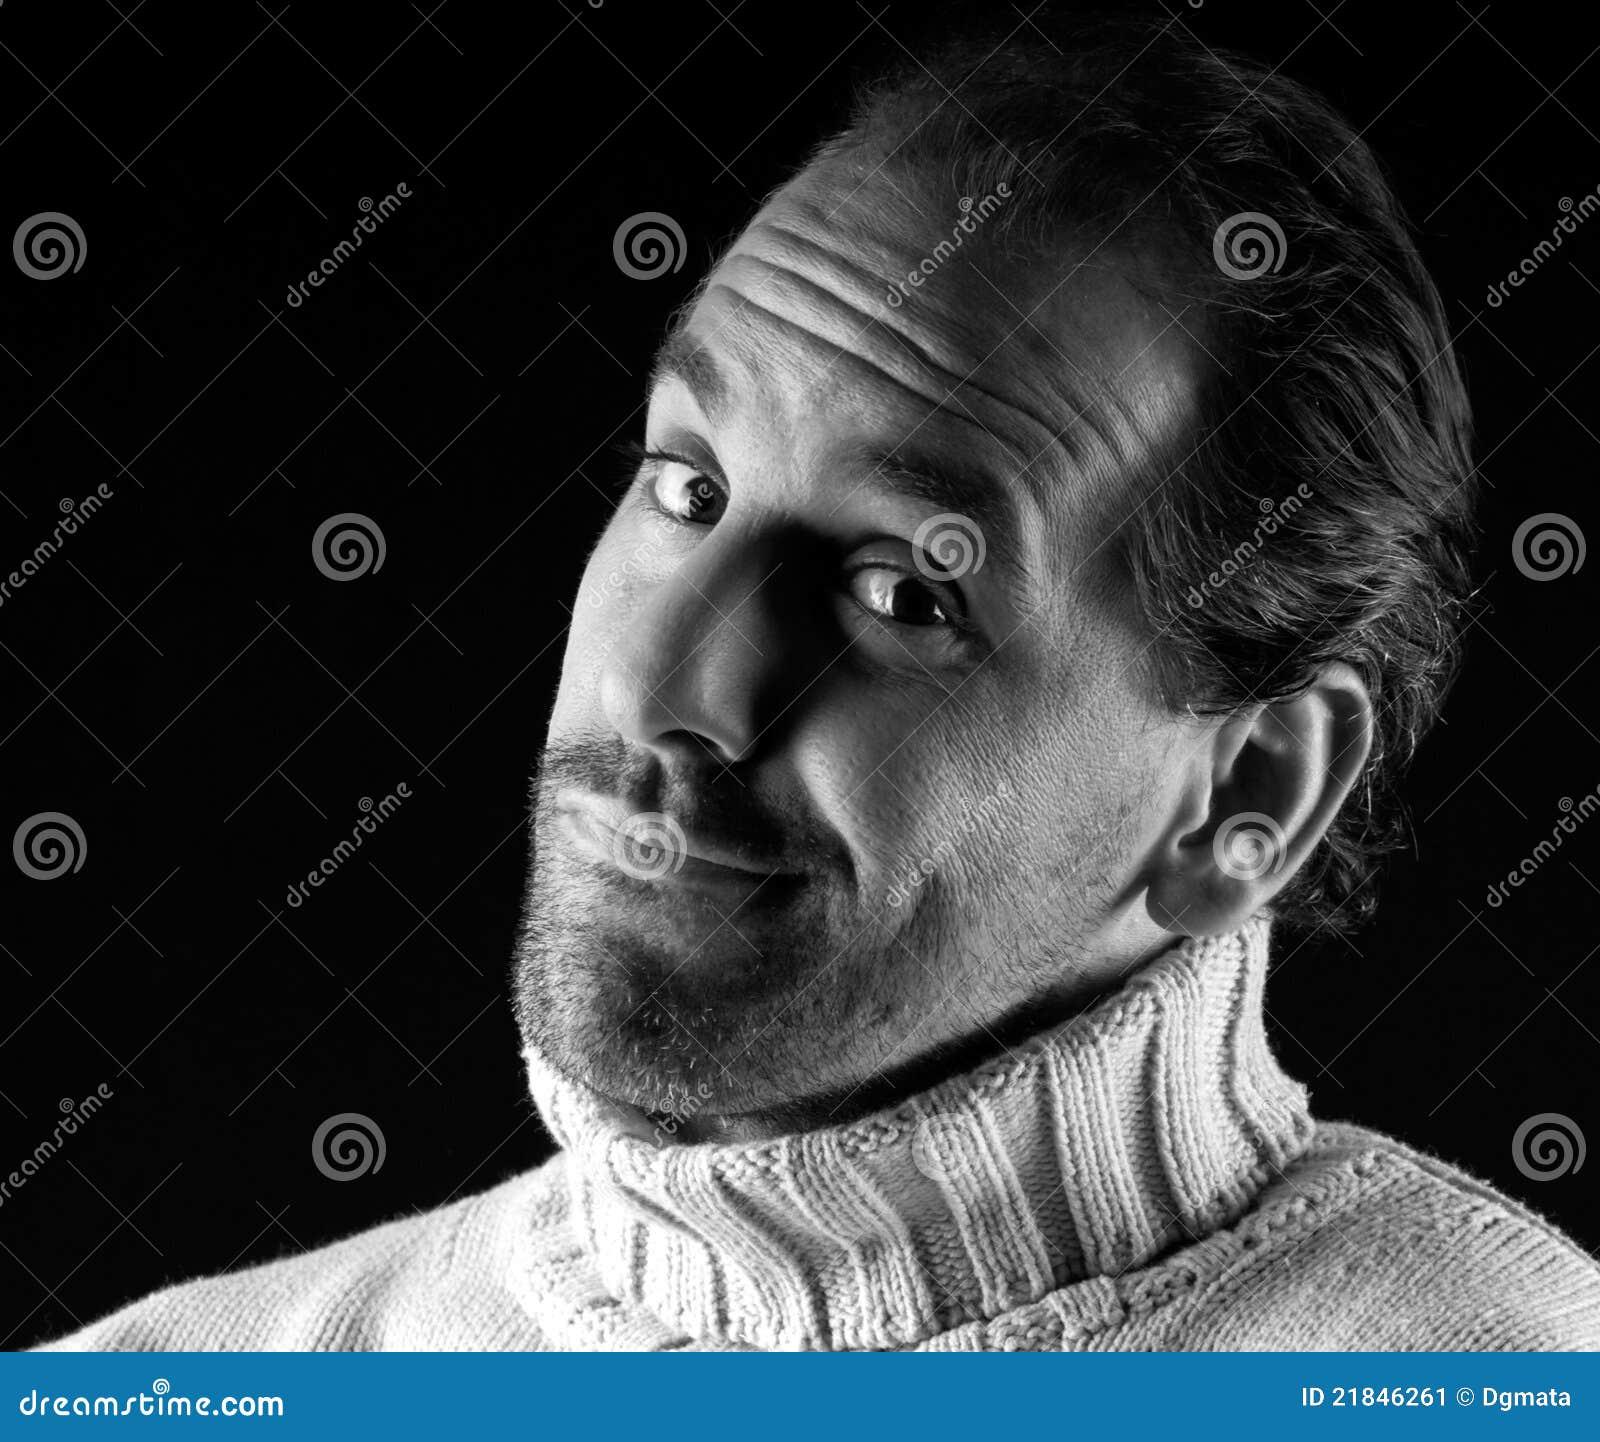 Adult man portrait cheerful expression black white